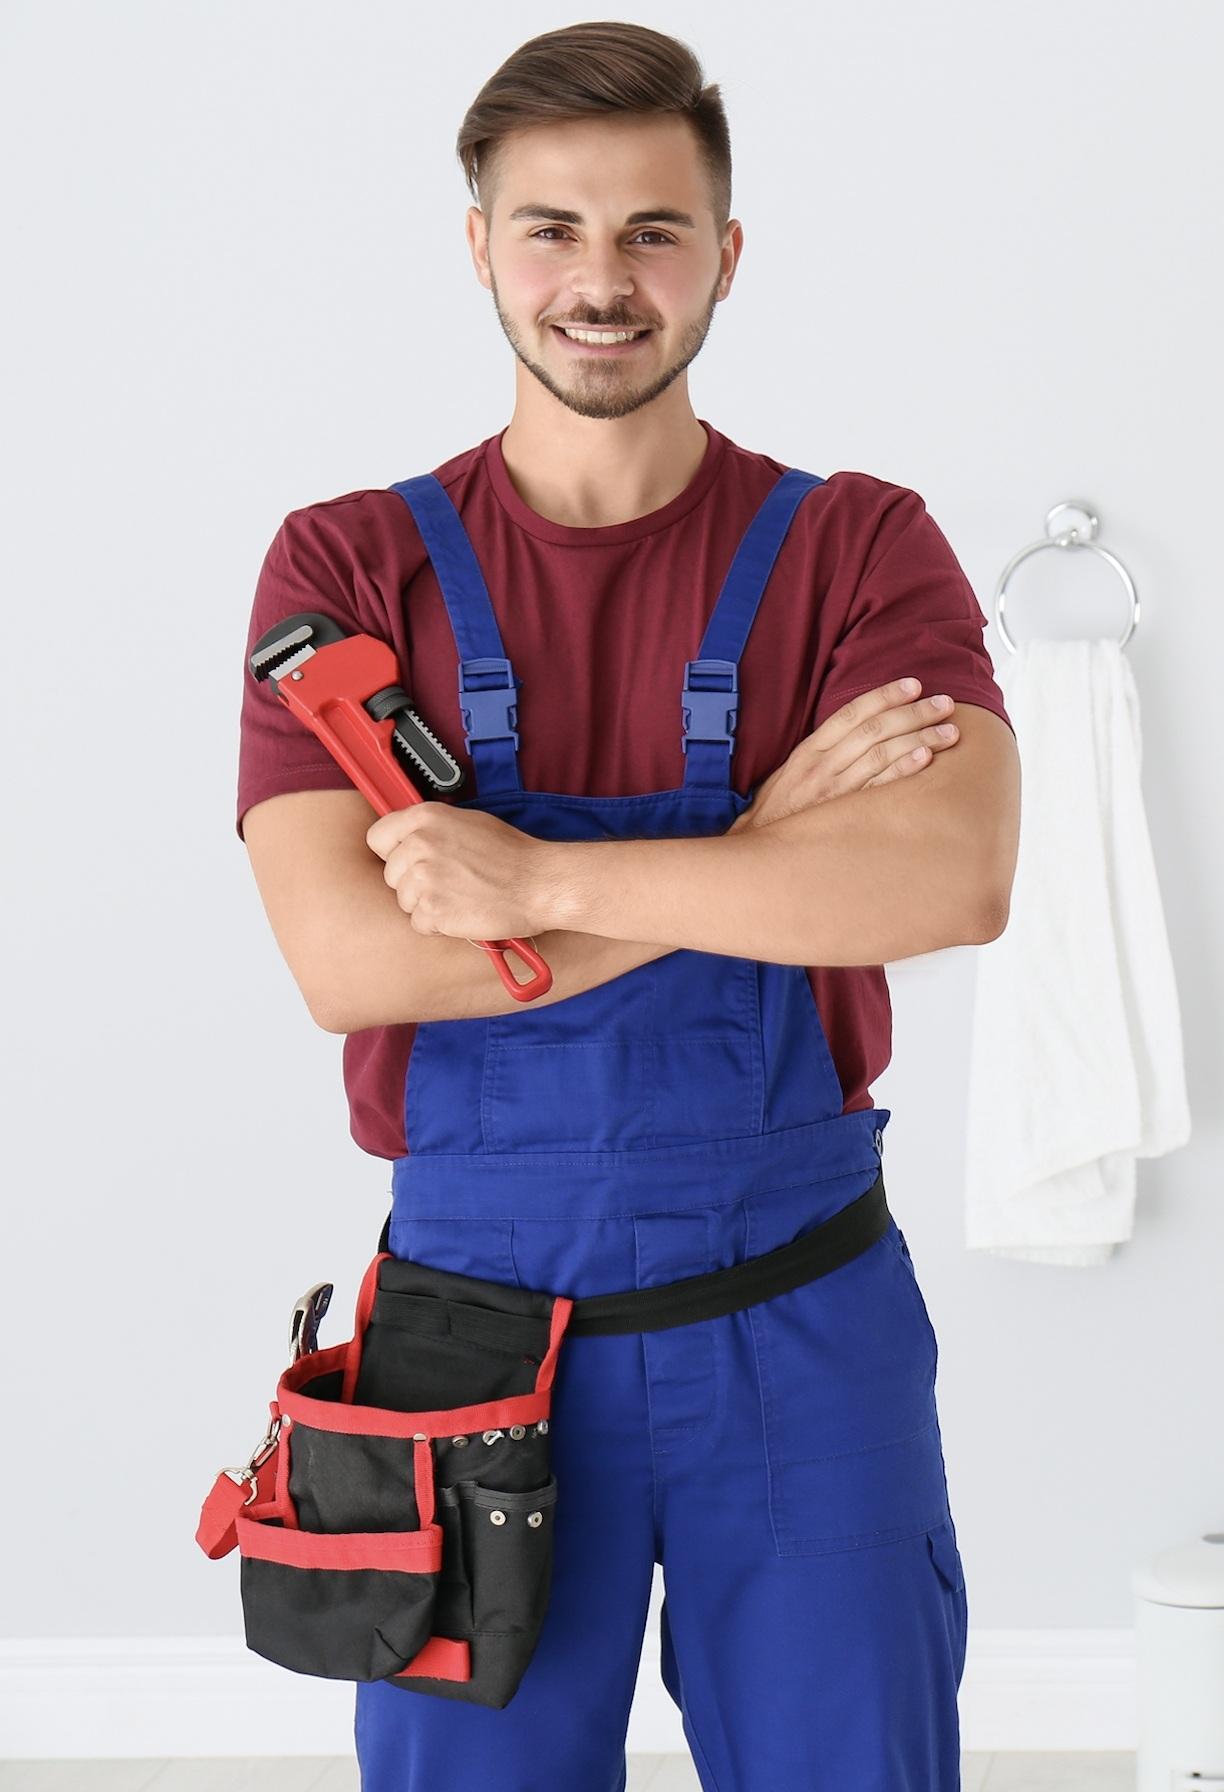 plombier urgence Yverdon suisse